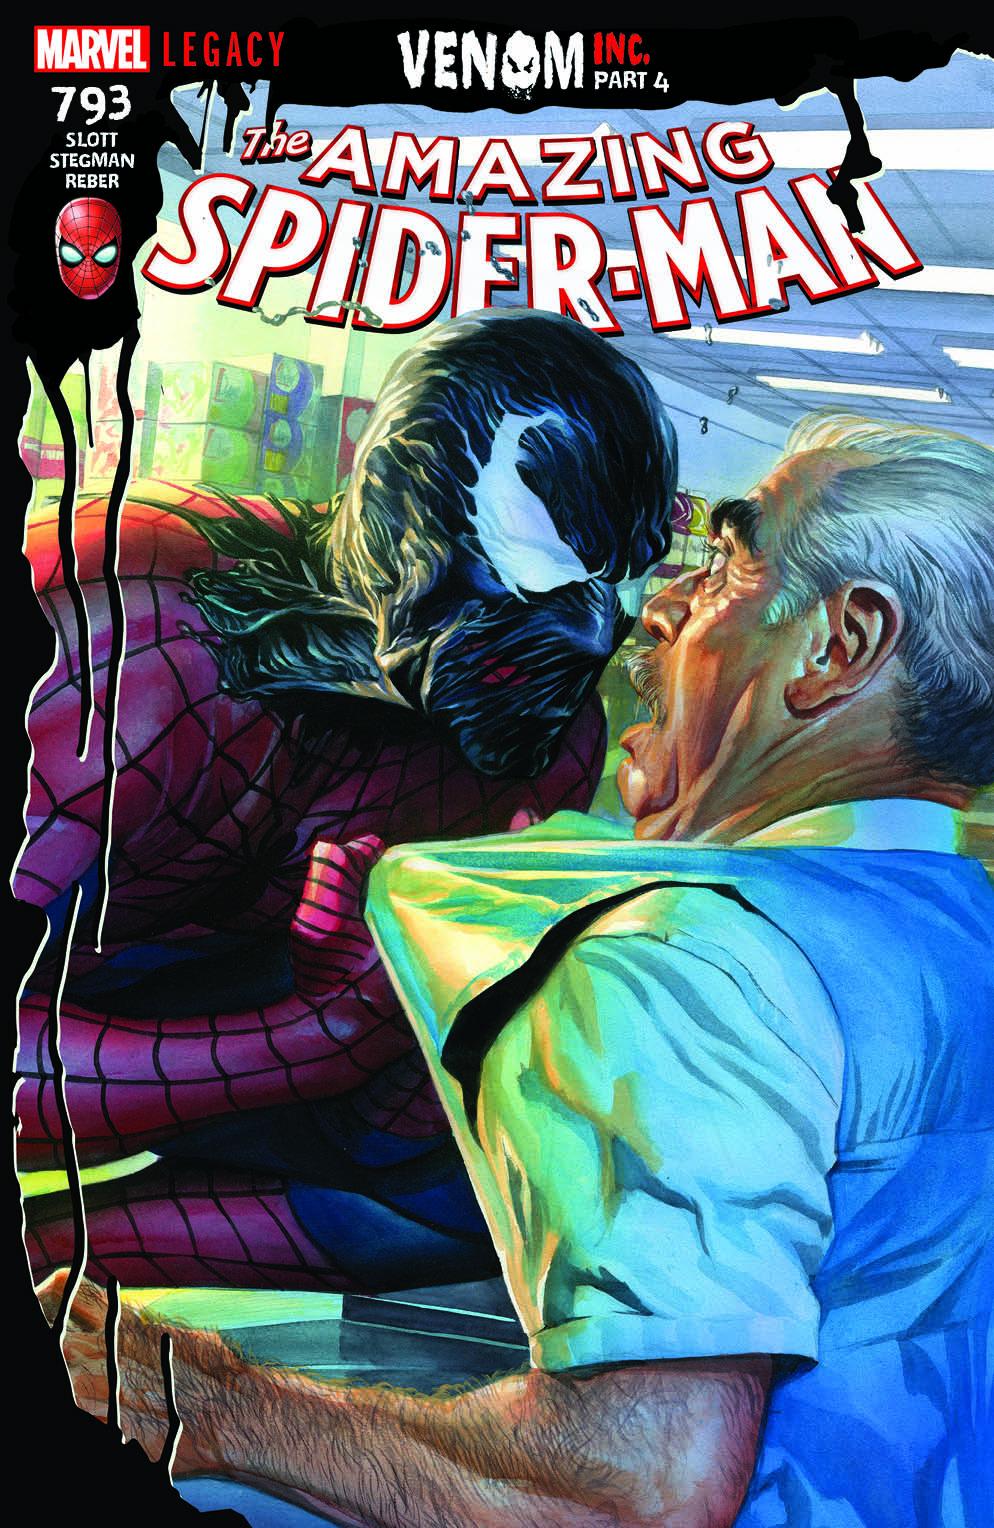 'Venom Inc' Arrives in the Marvel Universe!